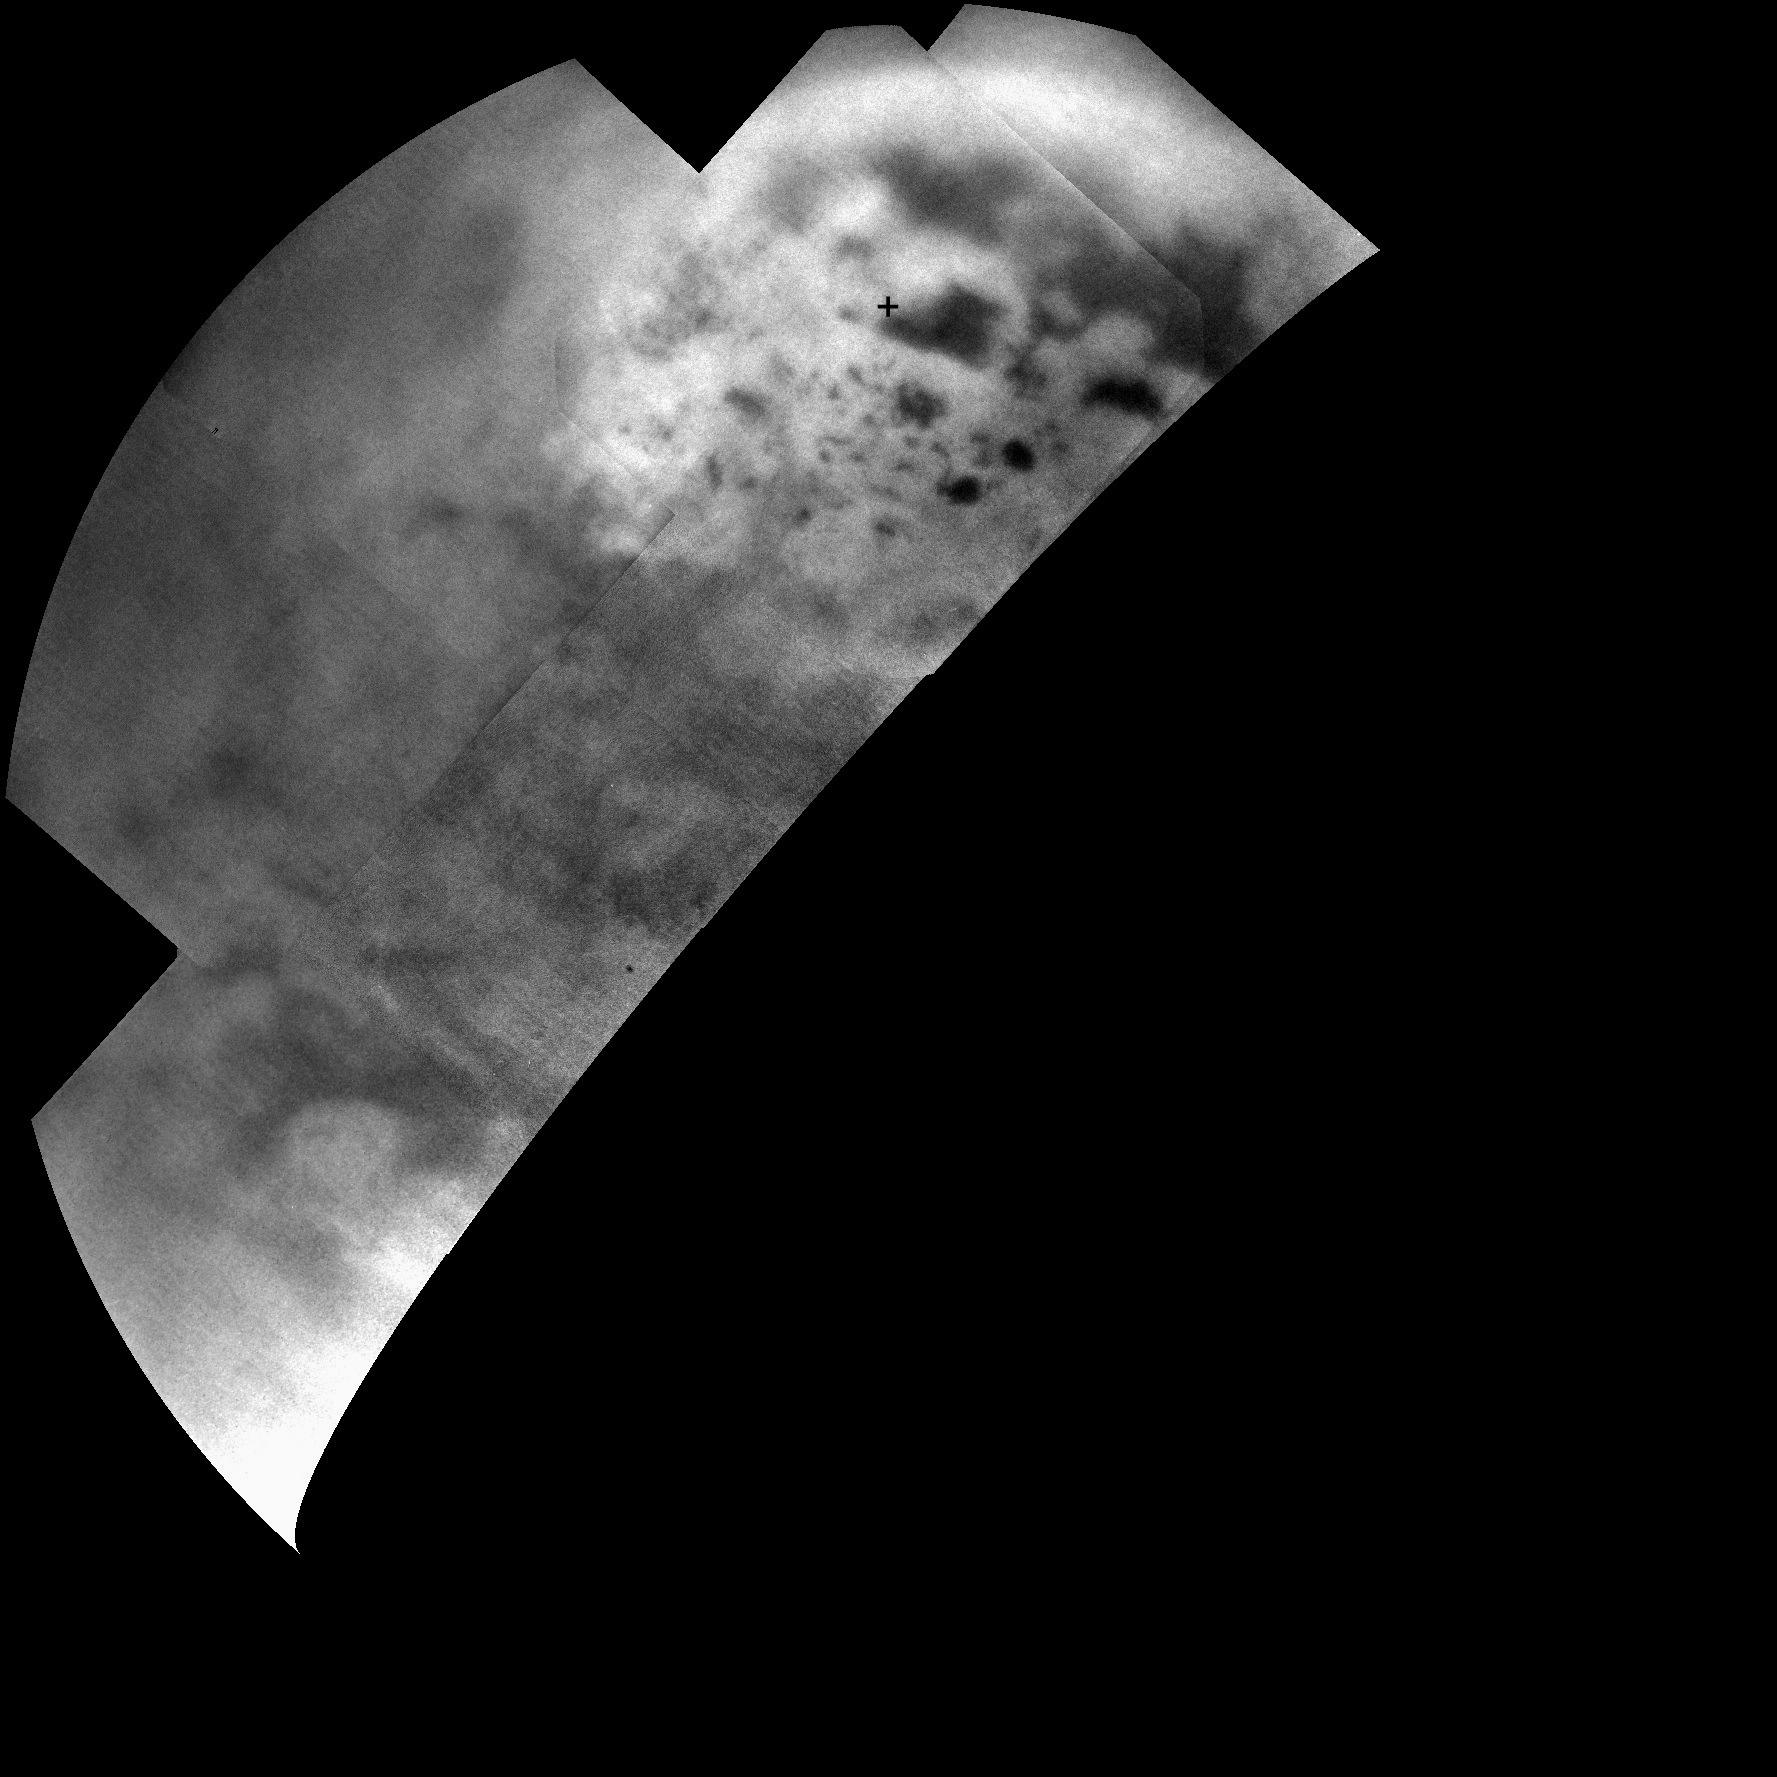 Dark Lakes on a Bright Landscape (NASA Cassini Saturn Mission Image)